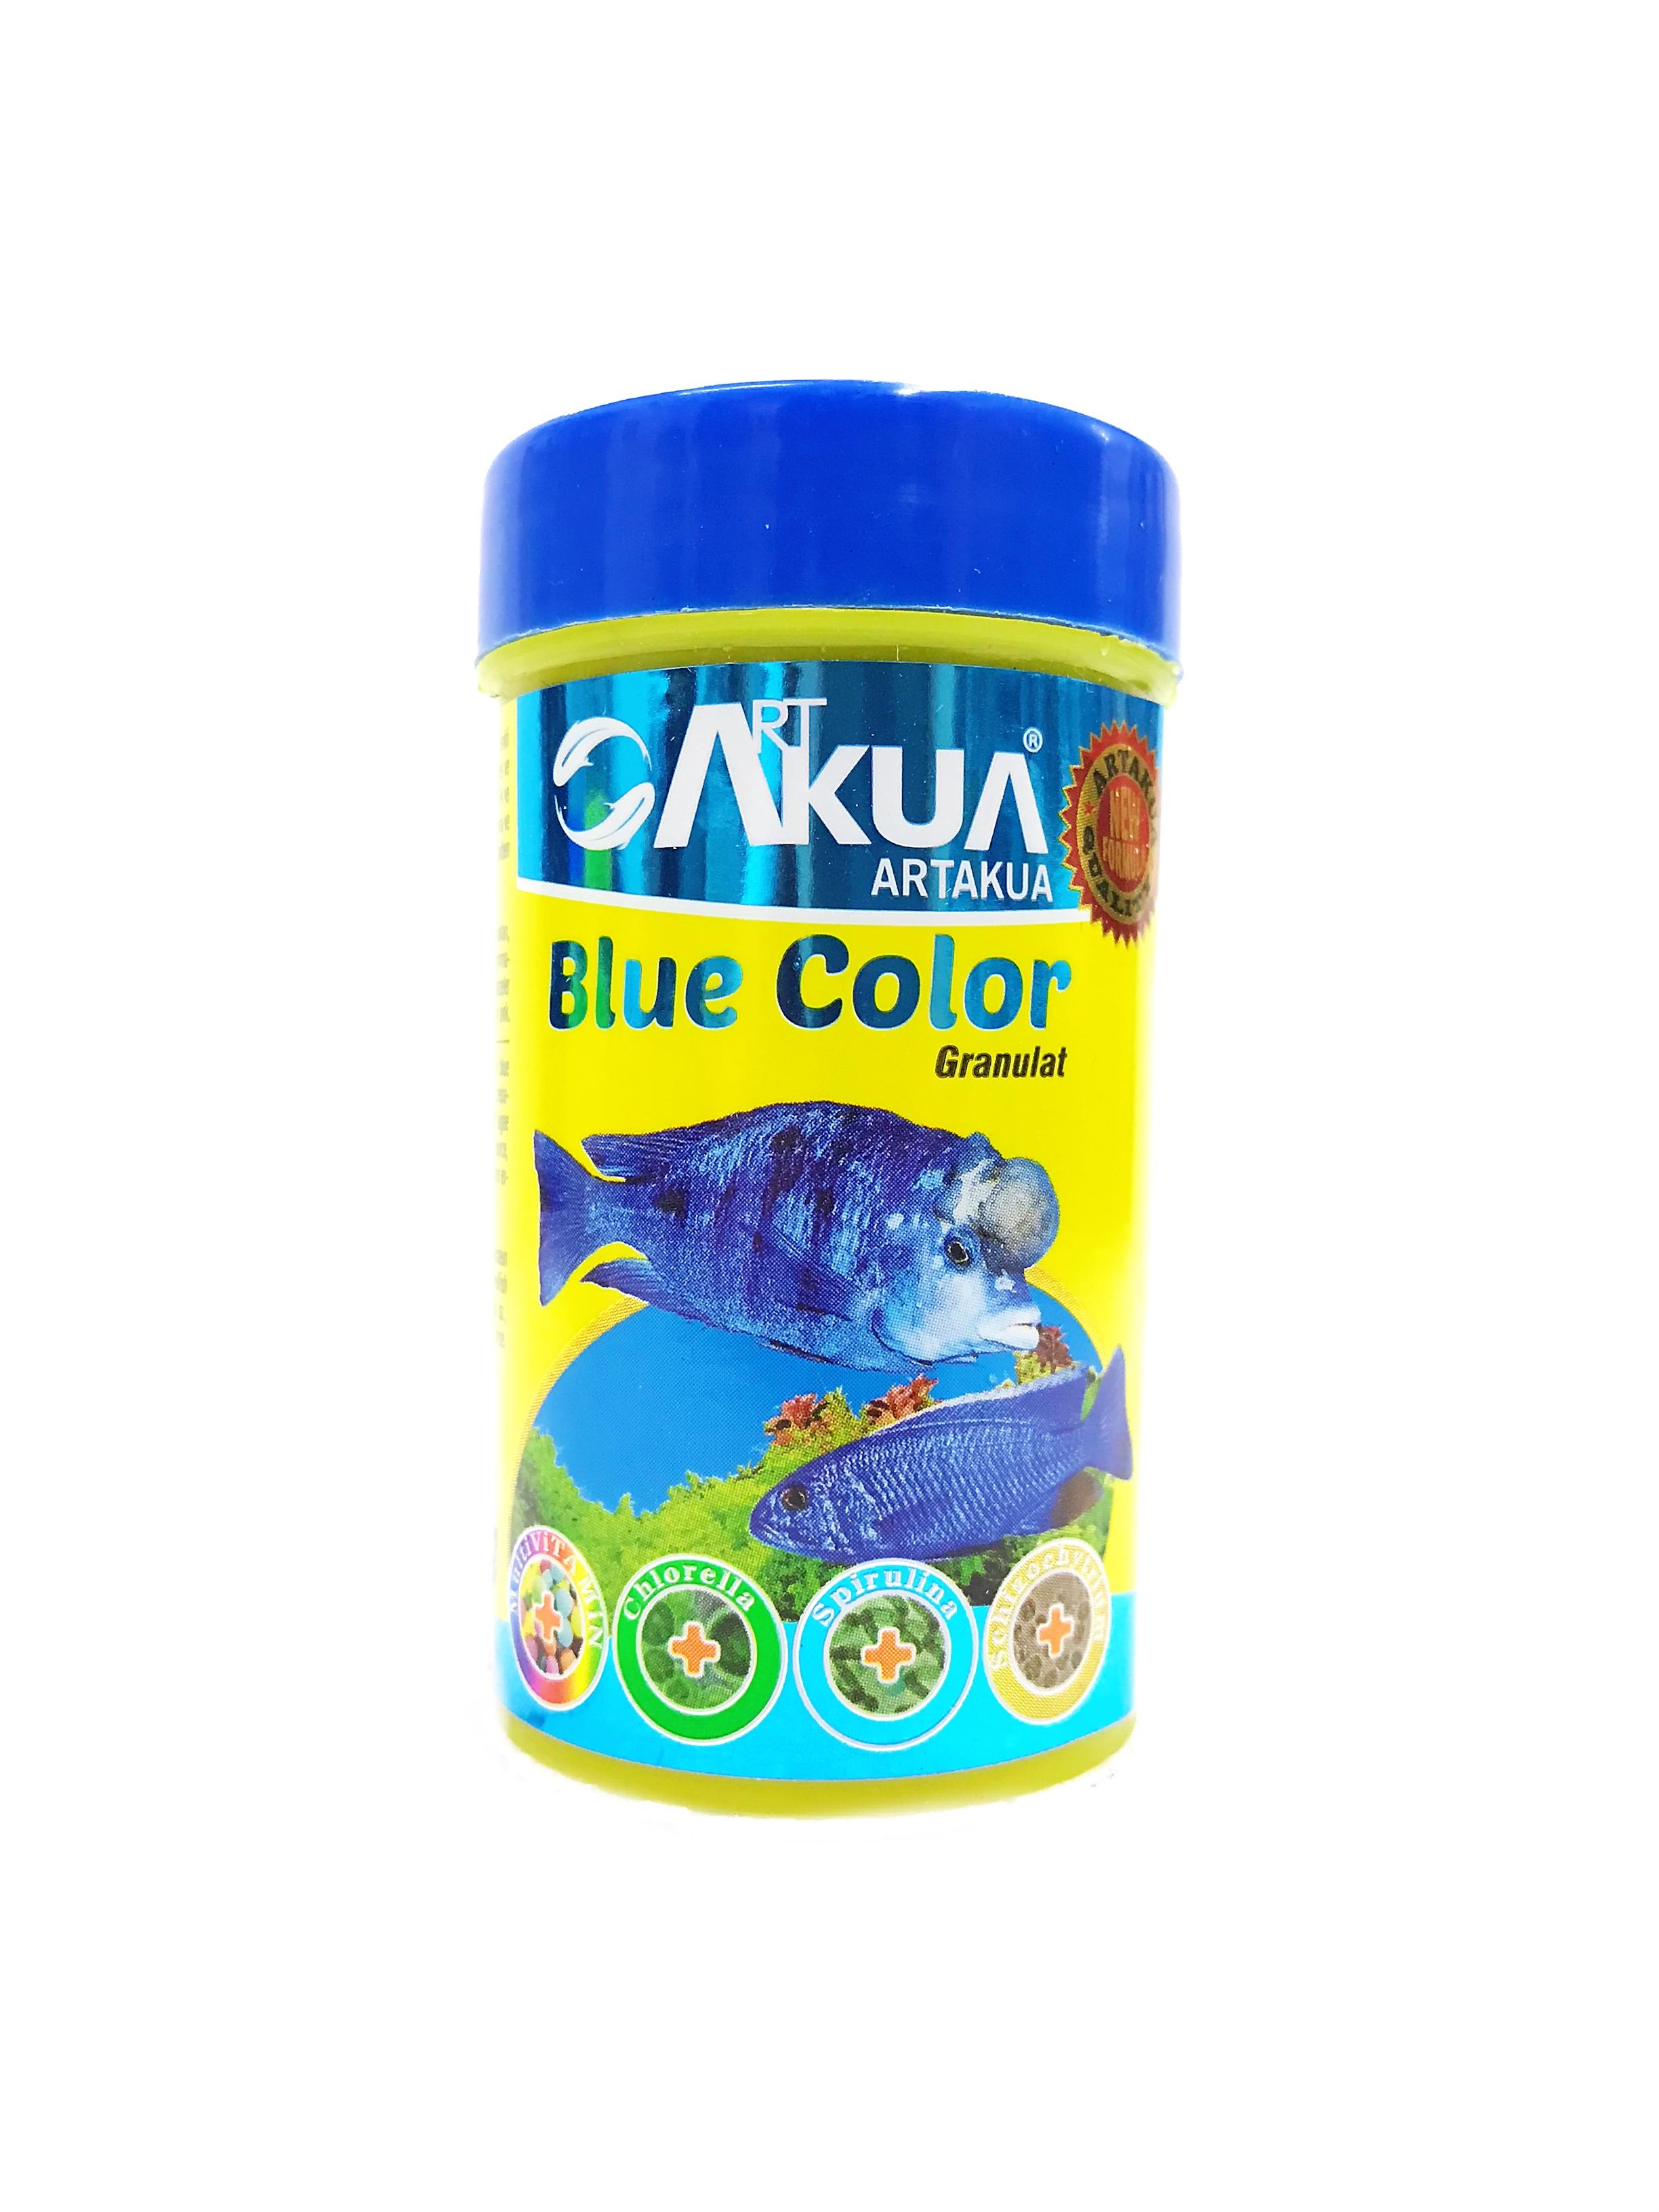 Artakua Blue Color